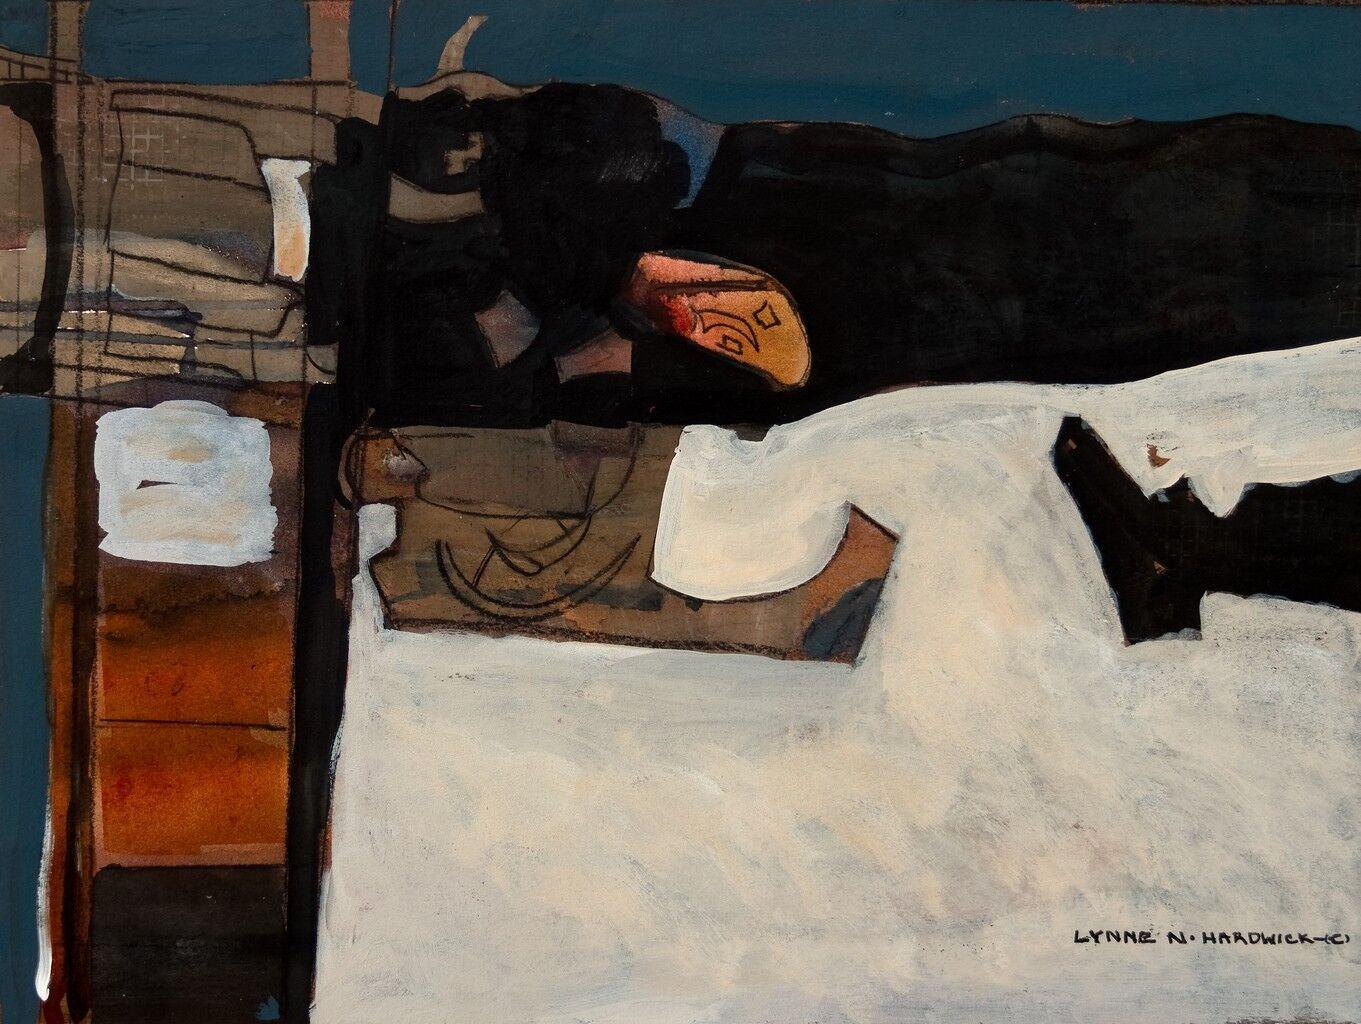 Lynne Hardwick, Abstract Miixed Media, Tumulus X